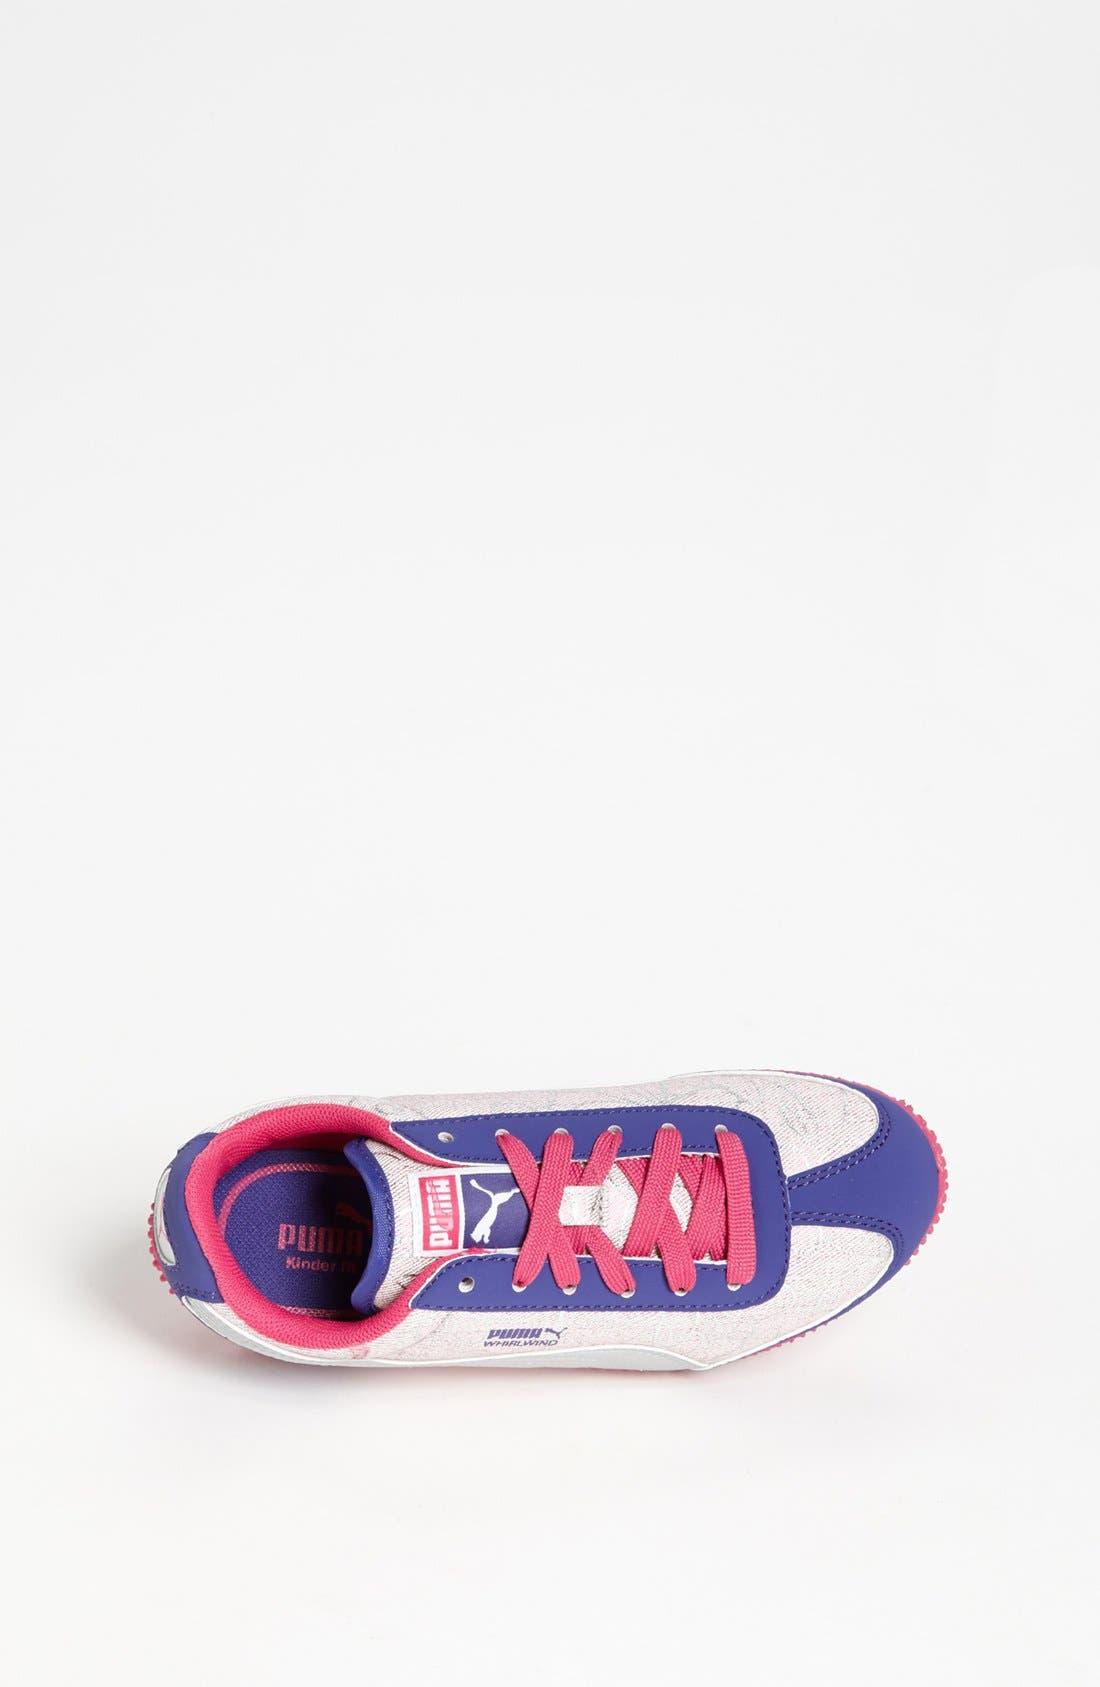 Alternate Image 3  - PUMA 'Whirlwind Swirl Jr.' Sneaker (Toddler, Little Kid & Big Kid)